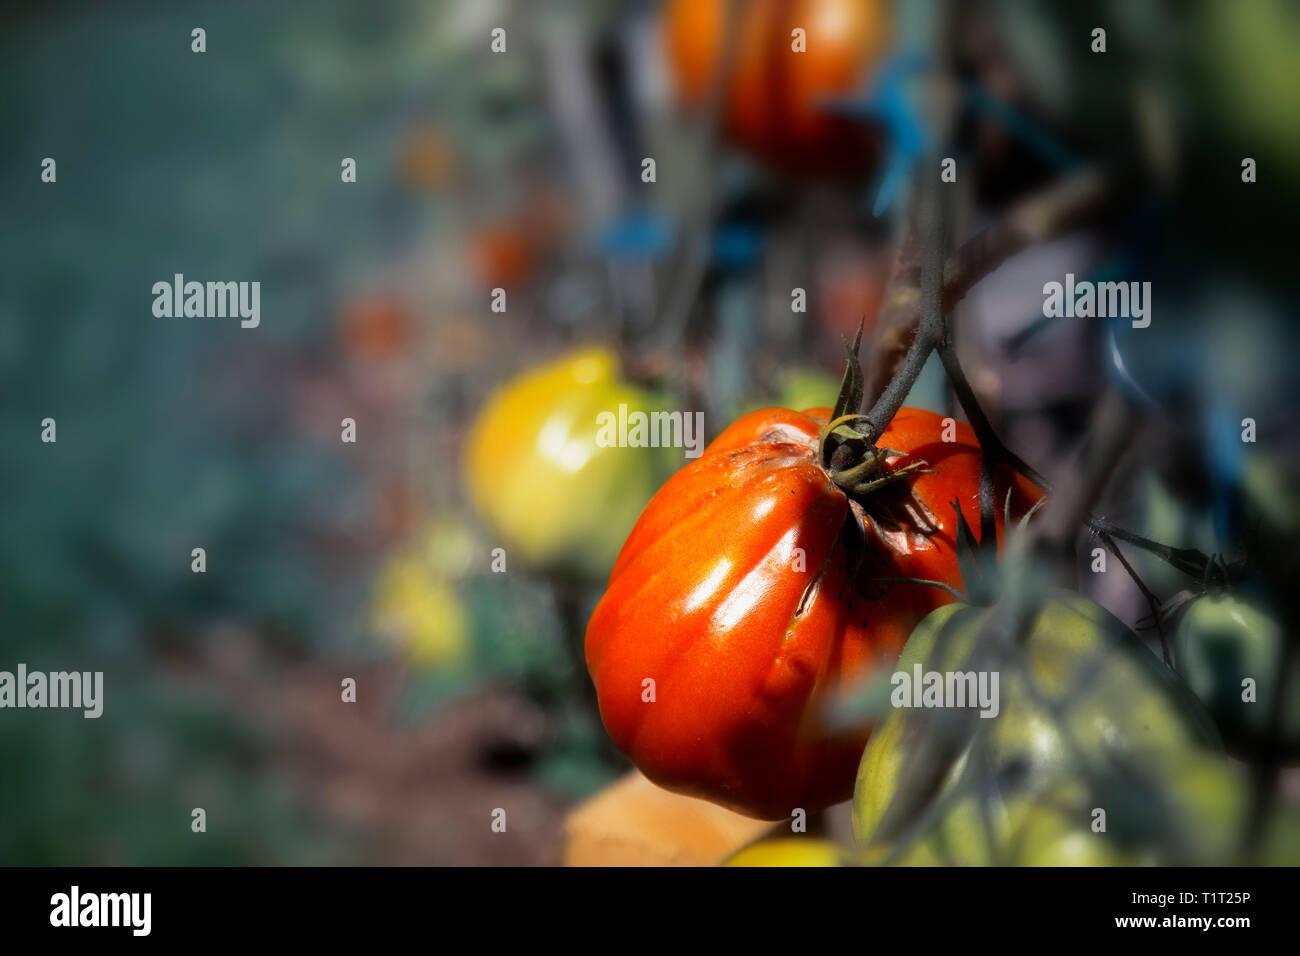 delicious red tomatoe on bush - Stock Image